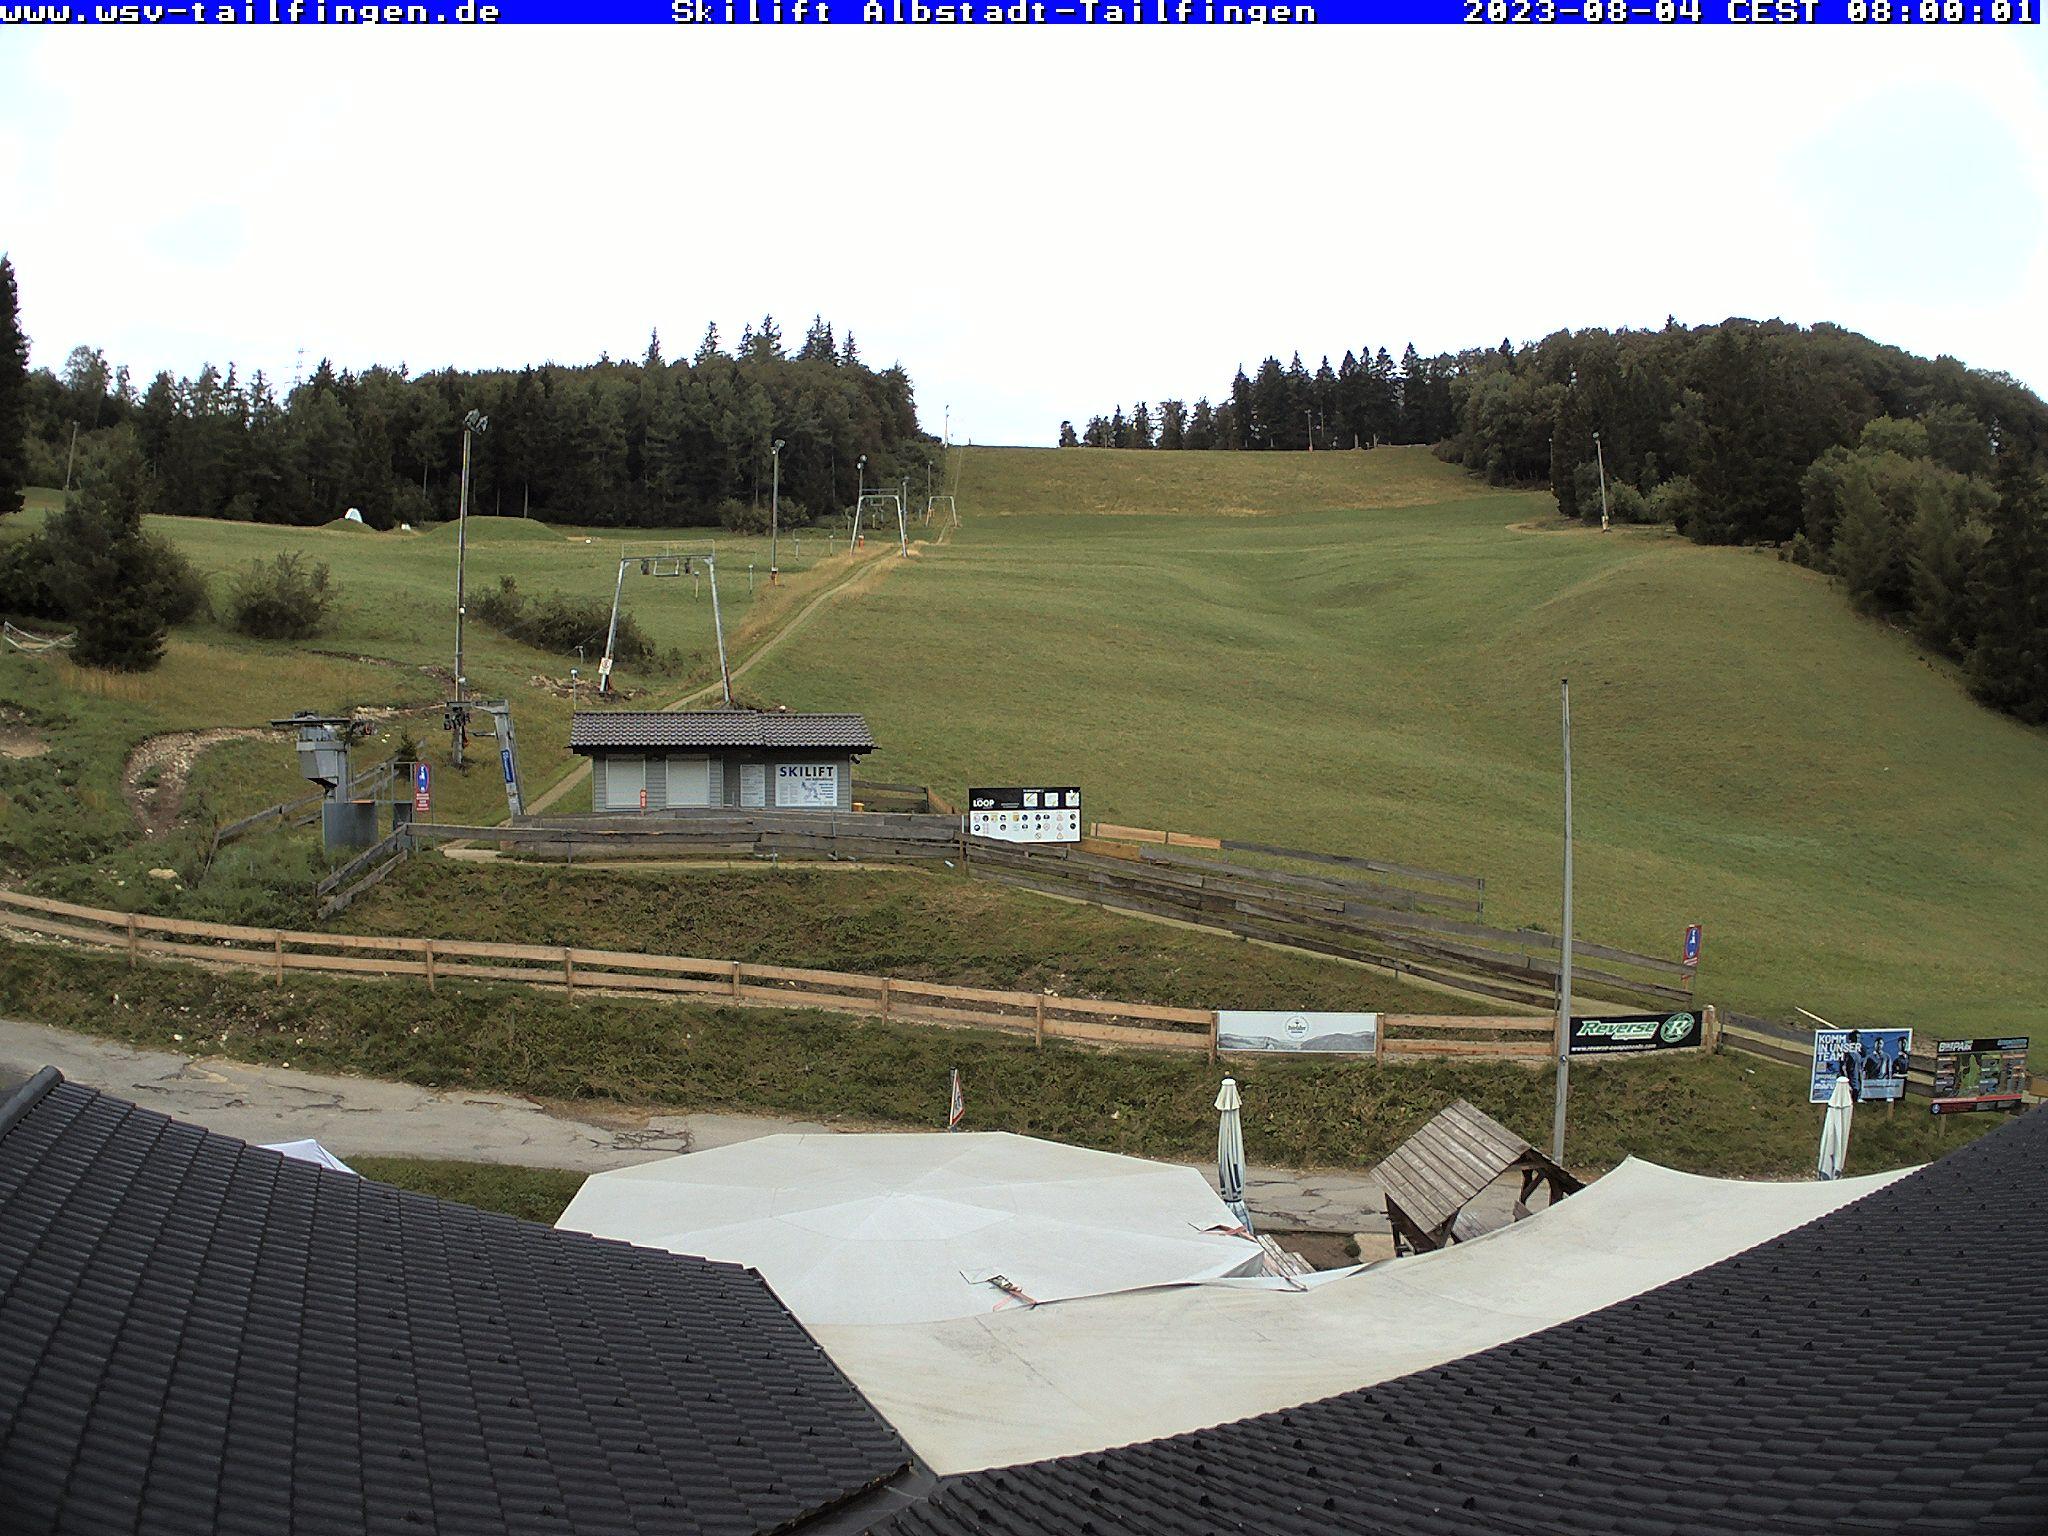 Webcam-Foto 08:00 Uhr / Skilift Albstadt-Tailfingen